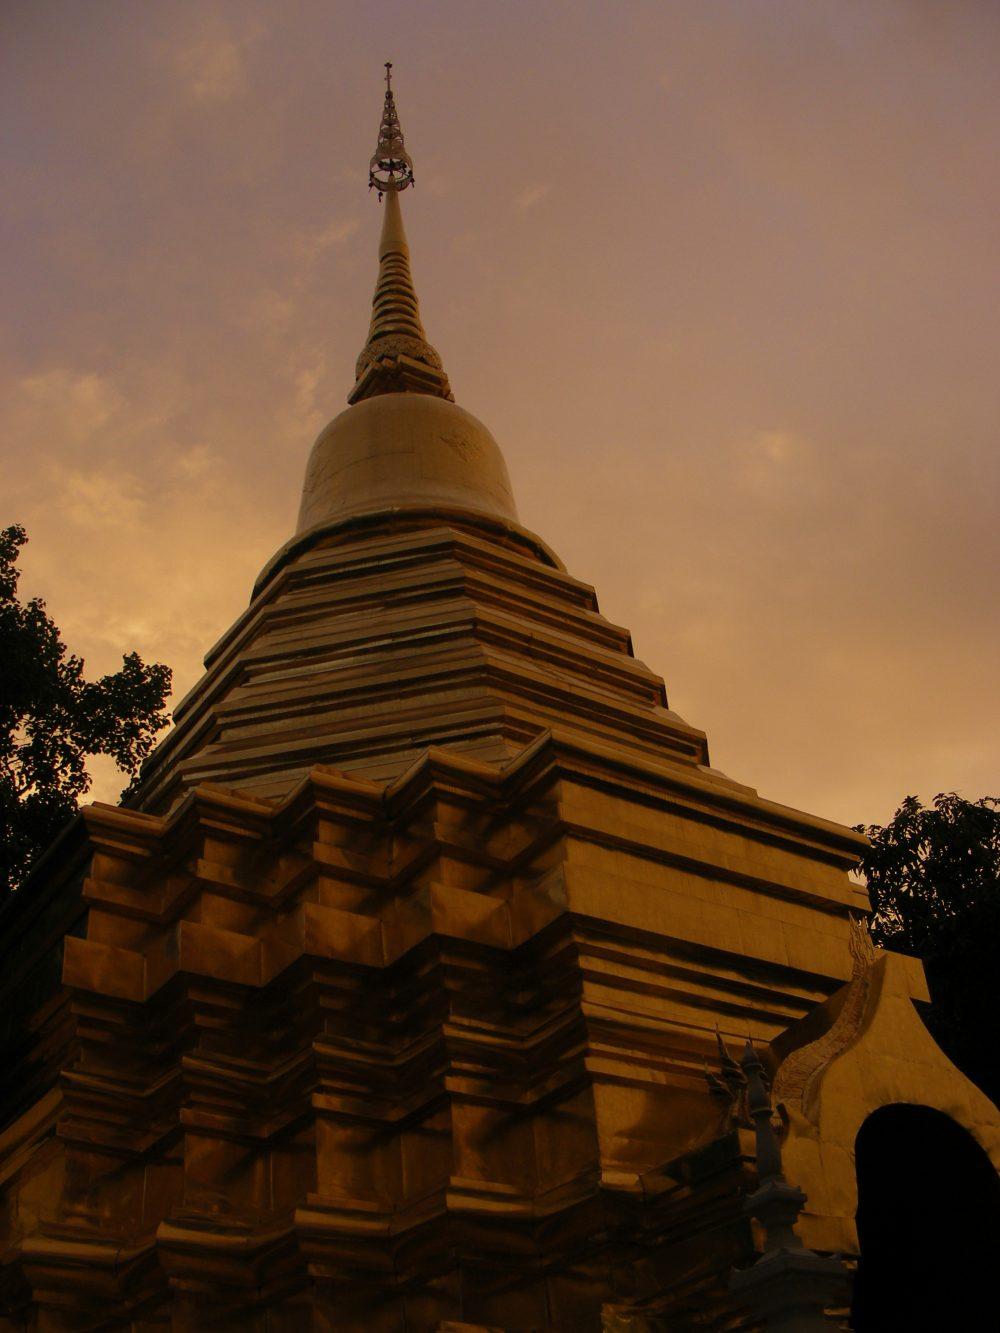 Luca Vivan, Chiang Mai, Thailand